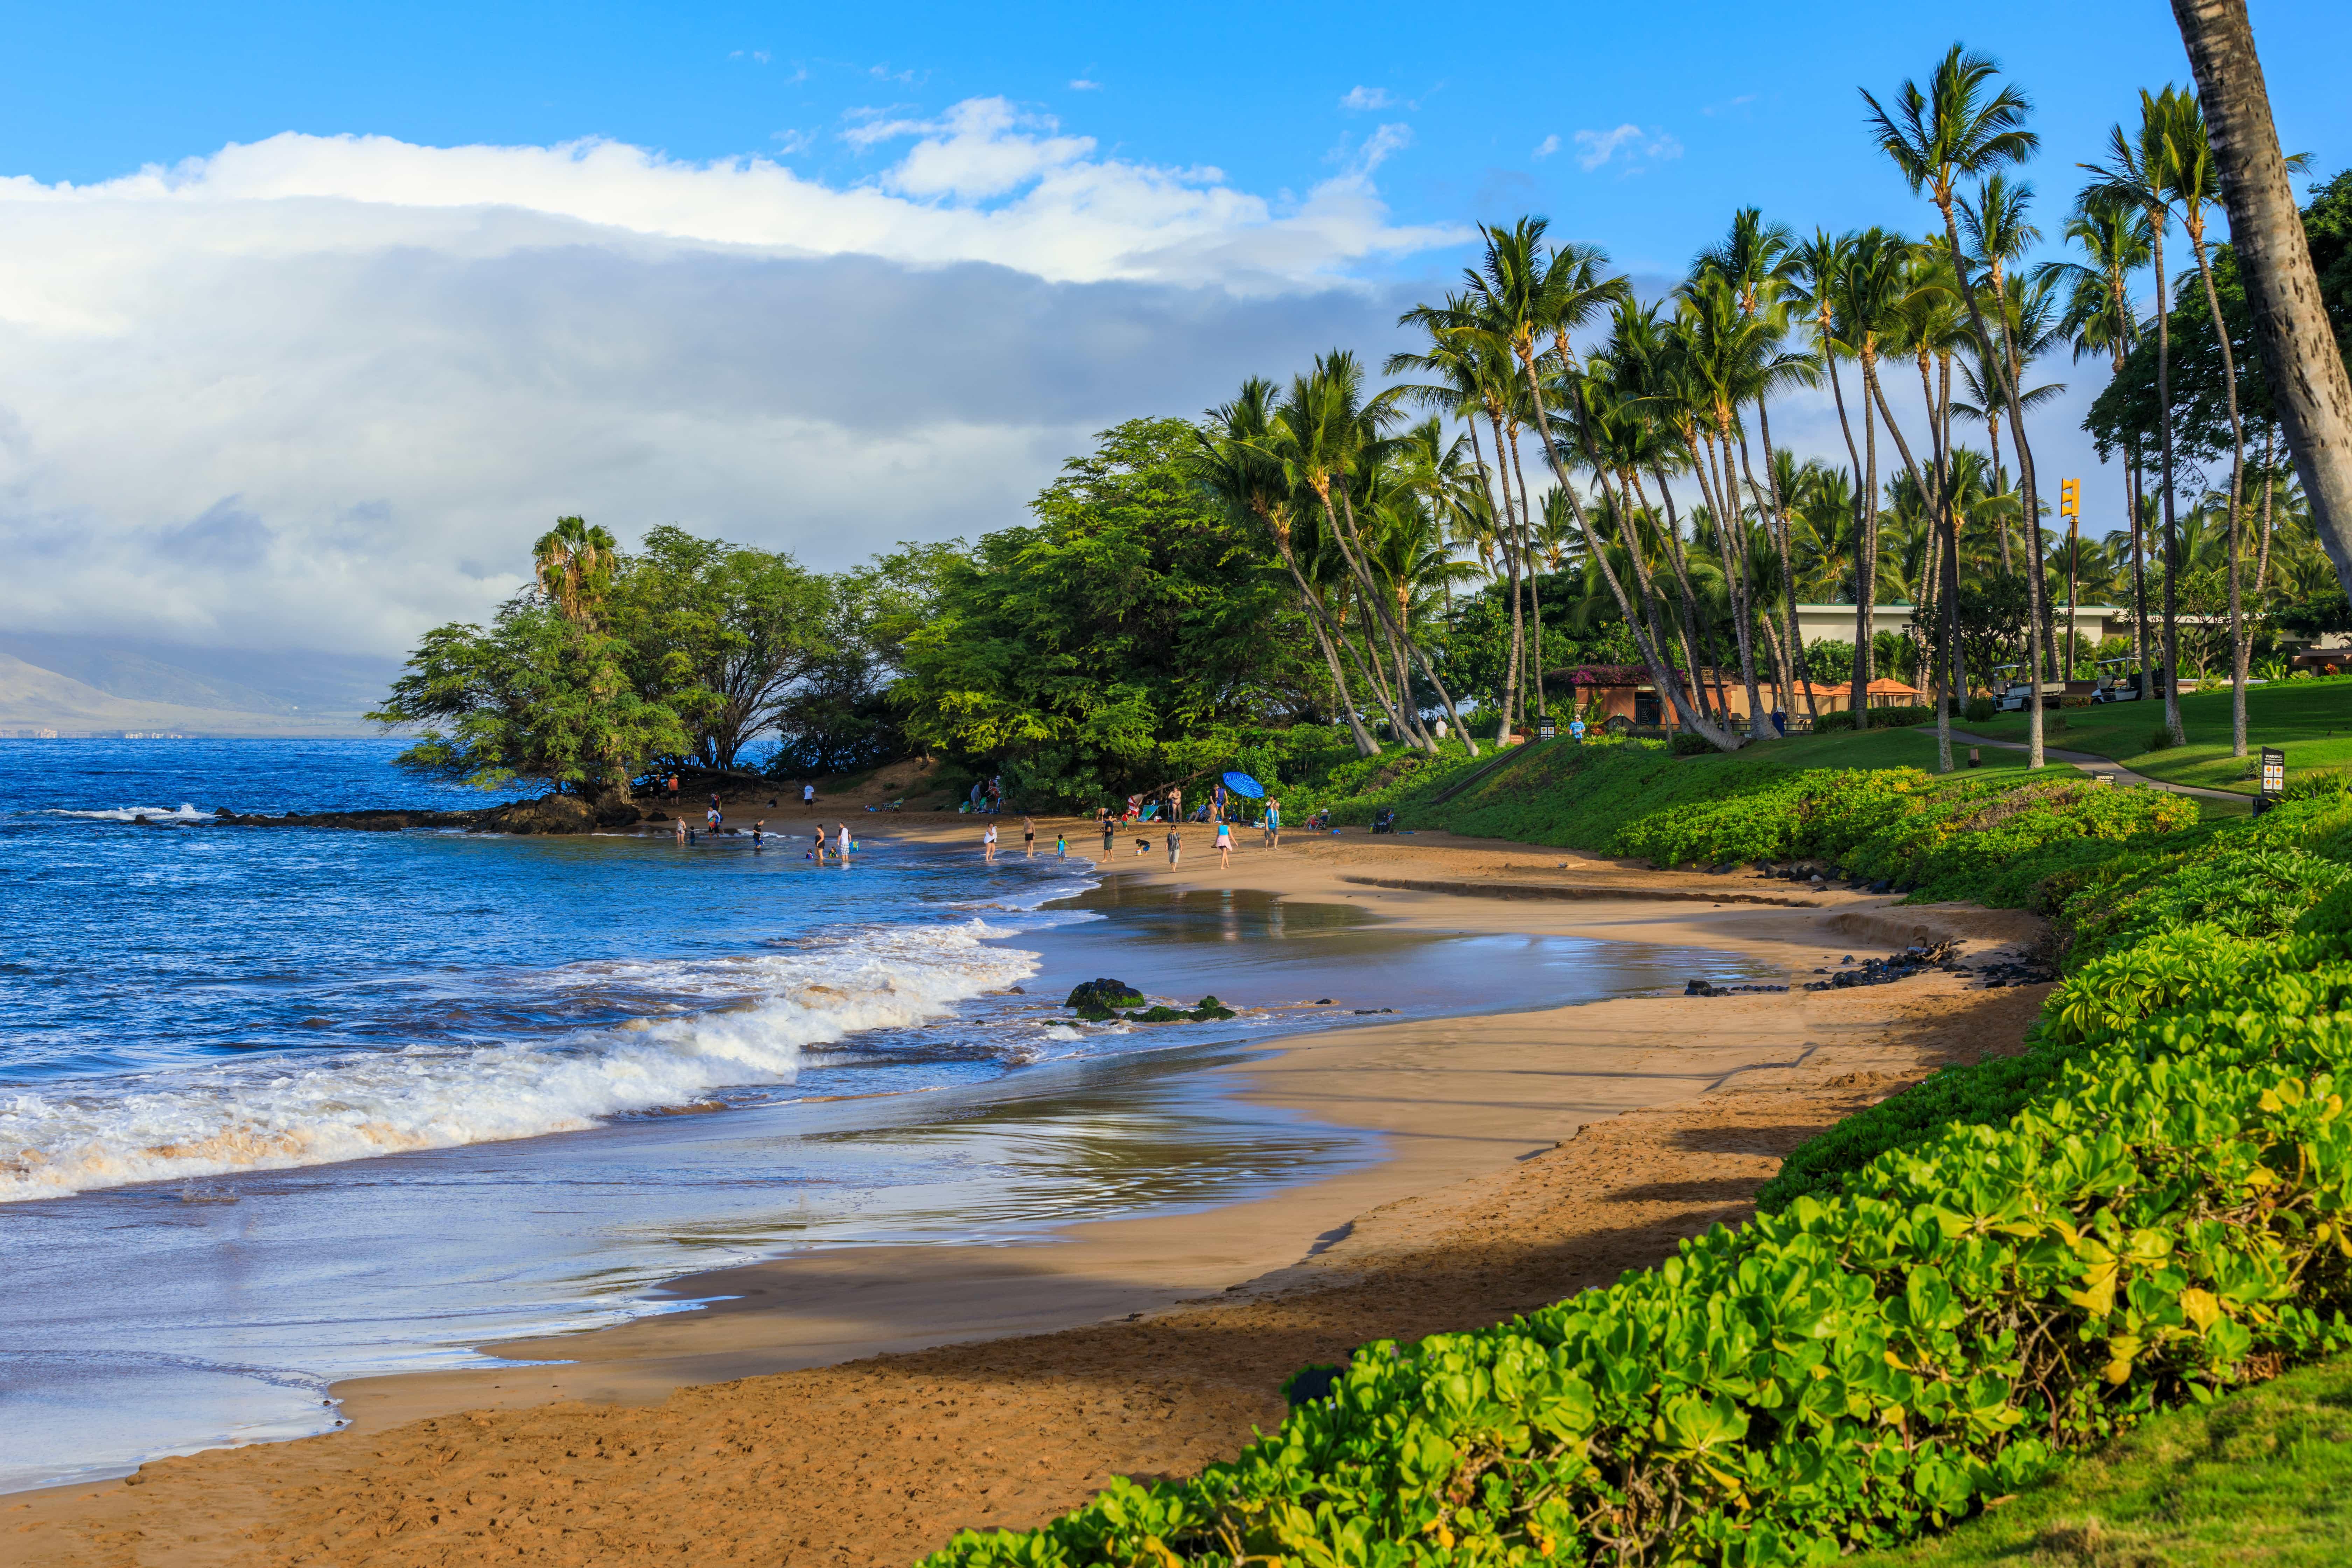 Wailea Beach in Hawaii